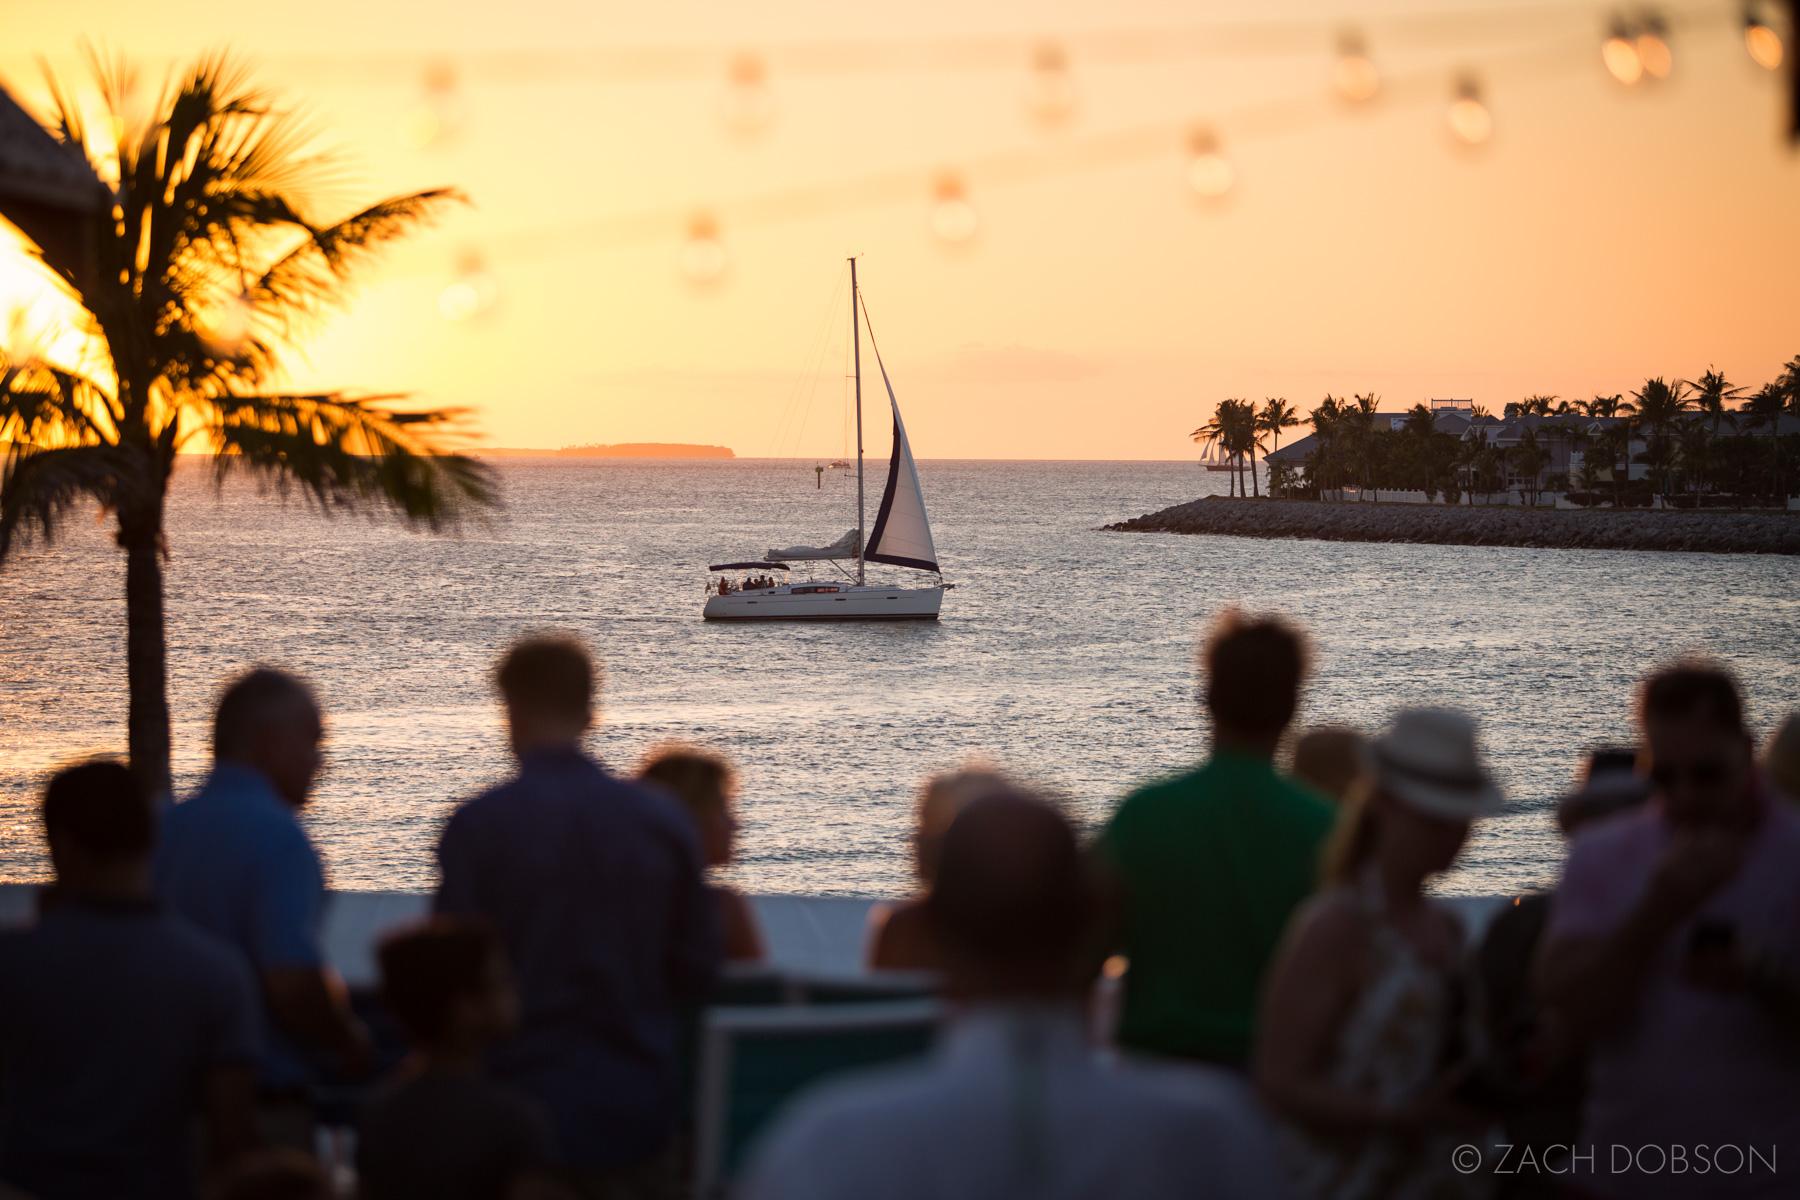 key-west-florida-bloomington-indiana-travel-tourism